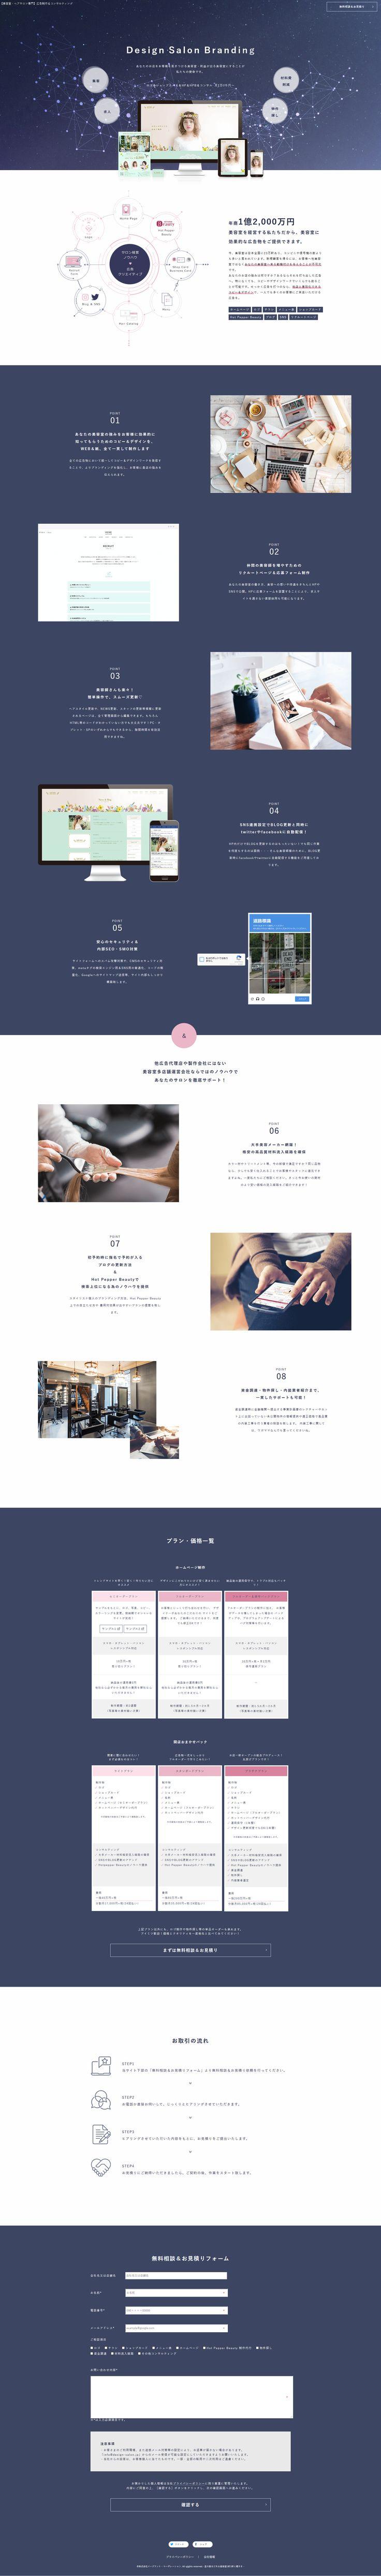 webデザイン、LP、ランディングページ、美容室広告、ホームページ作成、美容室ロゴ、美容室ショップカード、美容室チラシ、美容室コンサルティング、美容室独立支援、名刺作成